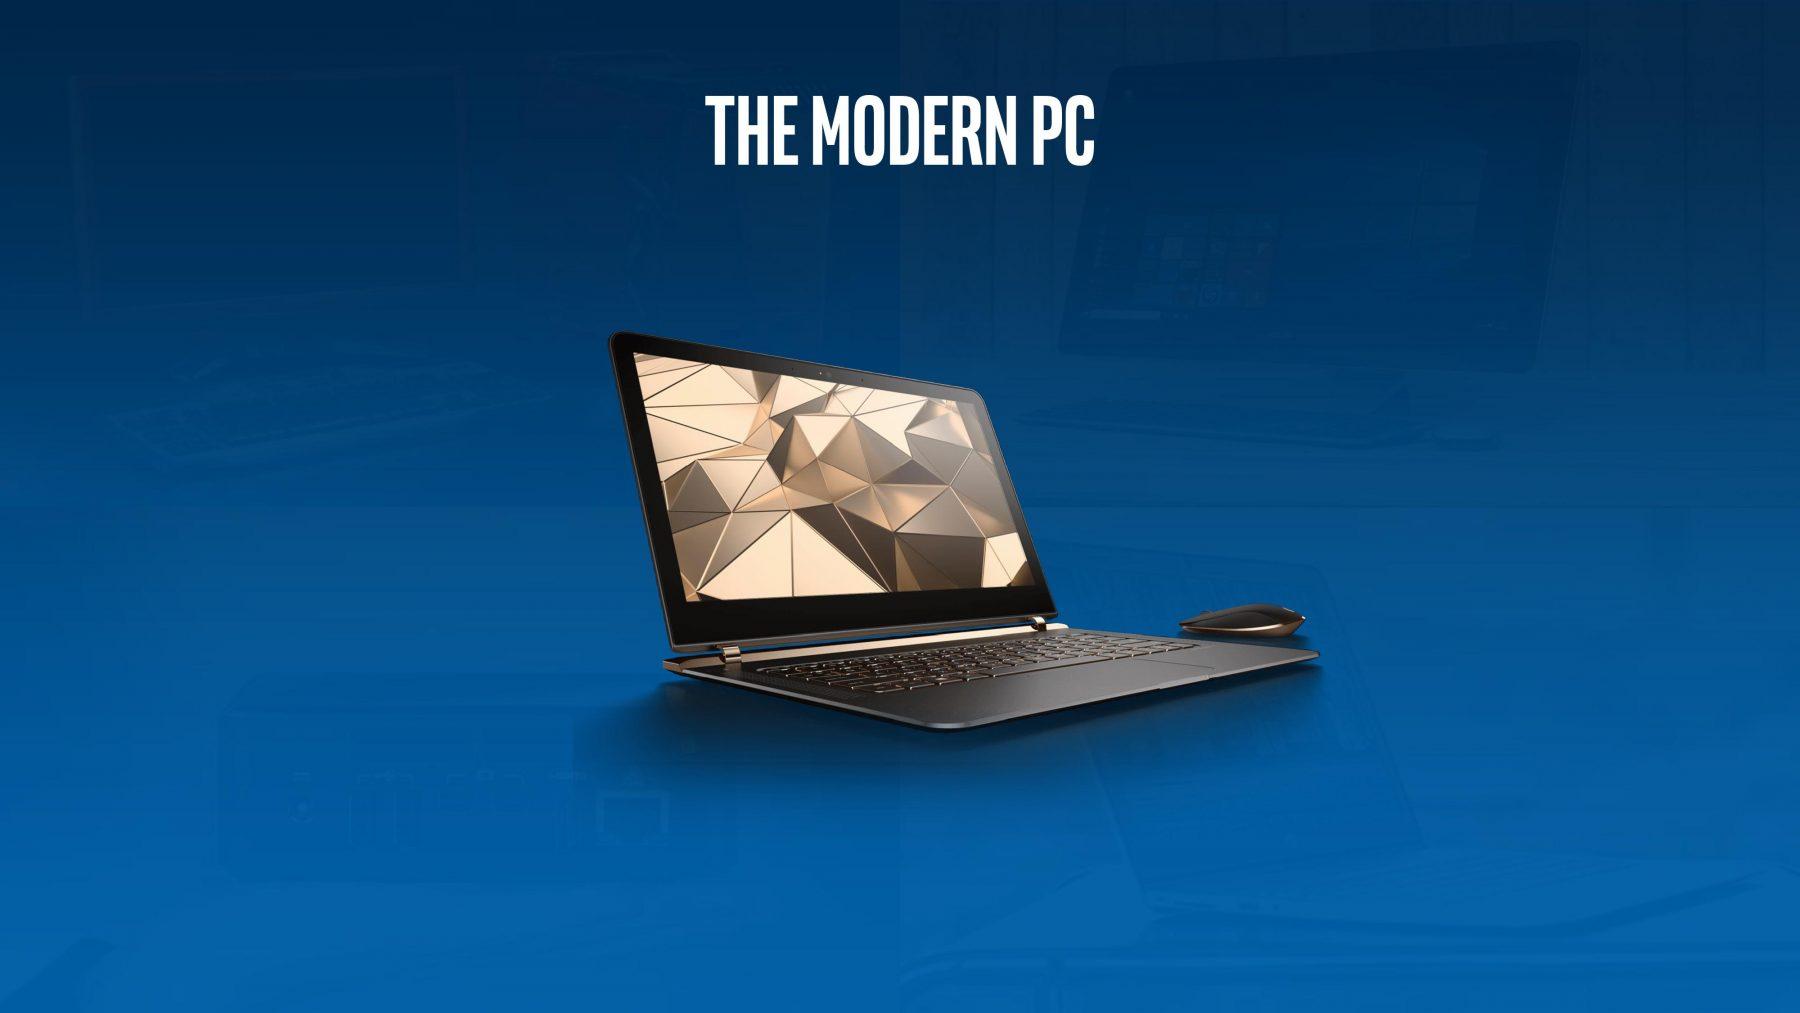 Intel Core i7-7700K SANDRA scores